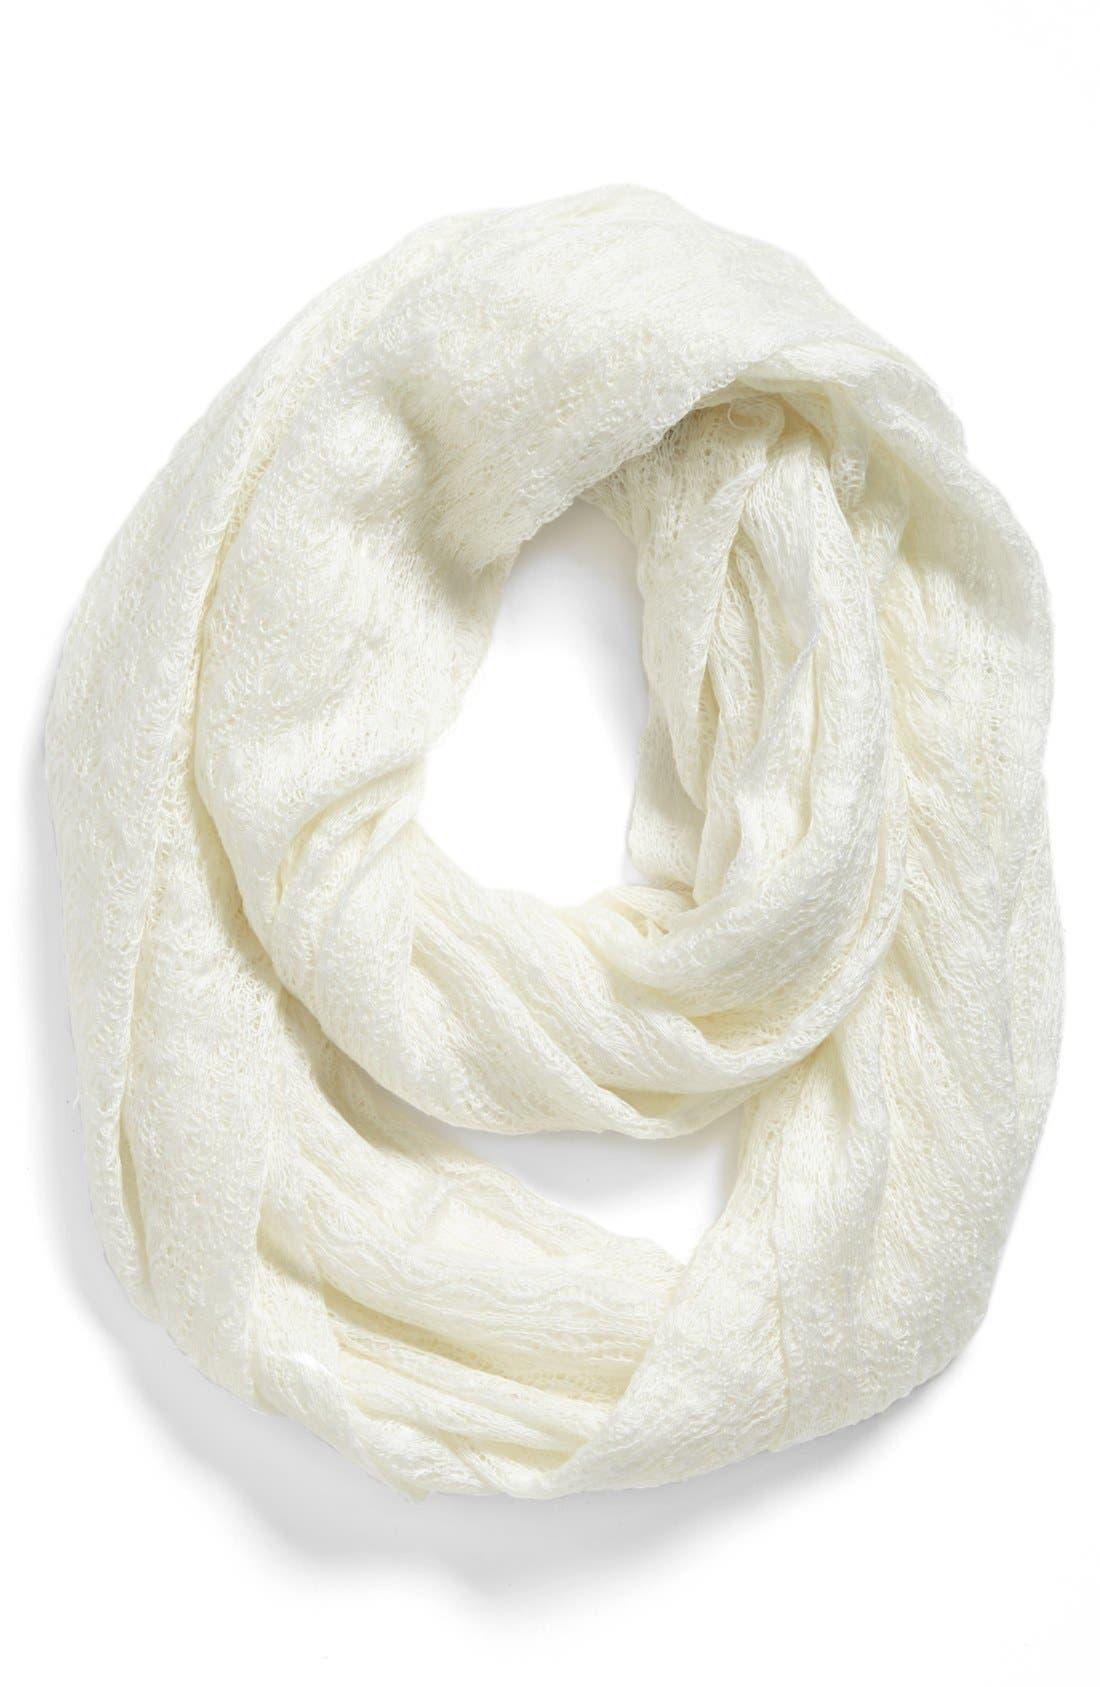 Alternate Image 1 Selected - Tildon Pointelle Knit Infinity Scarf